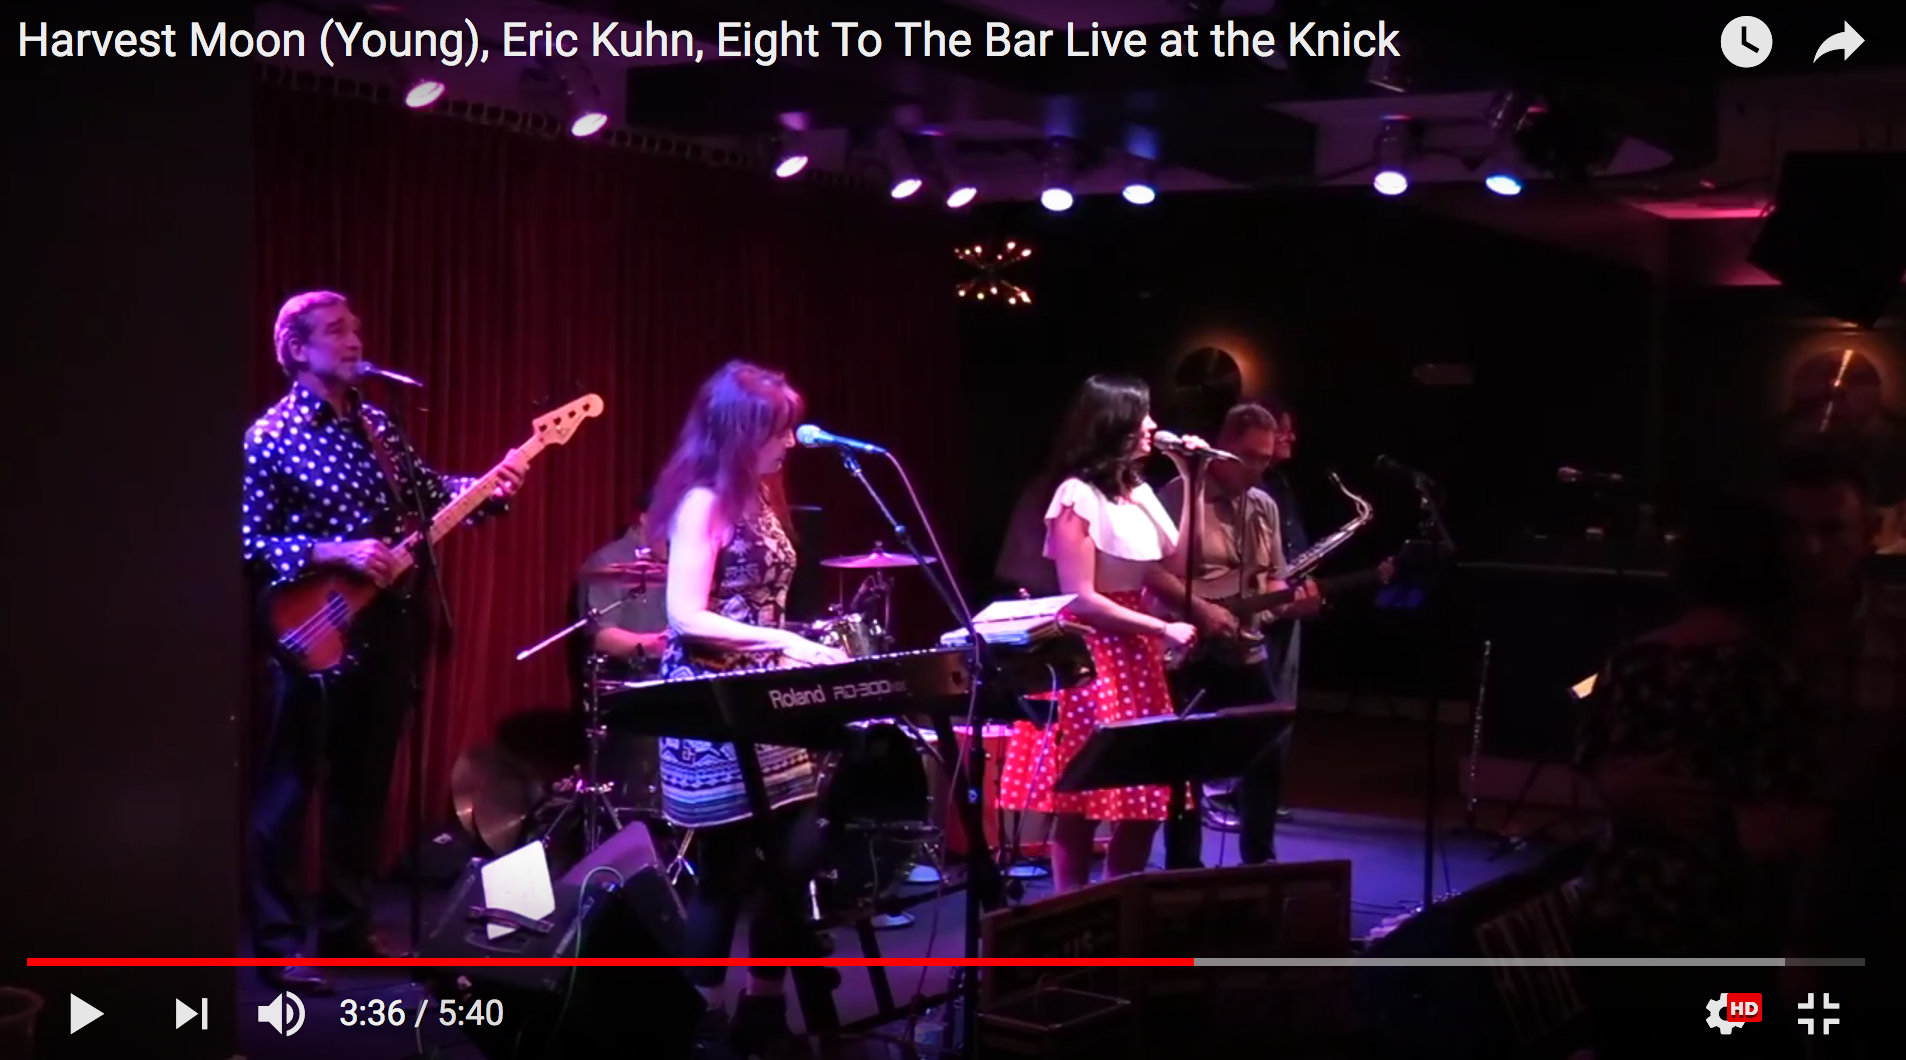 Harvest Moon - Eric Kuhn, Eight To The Bar